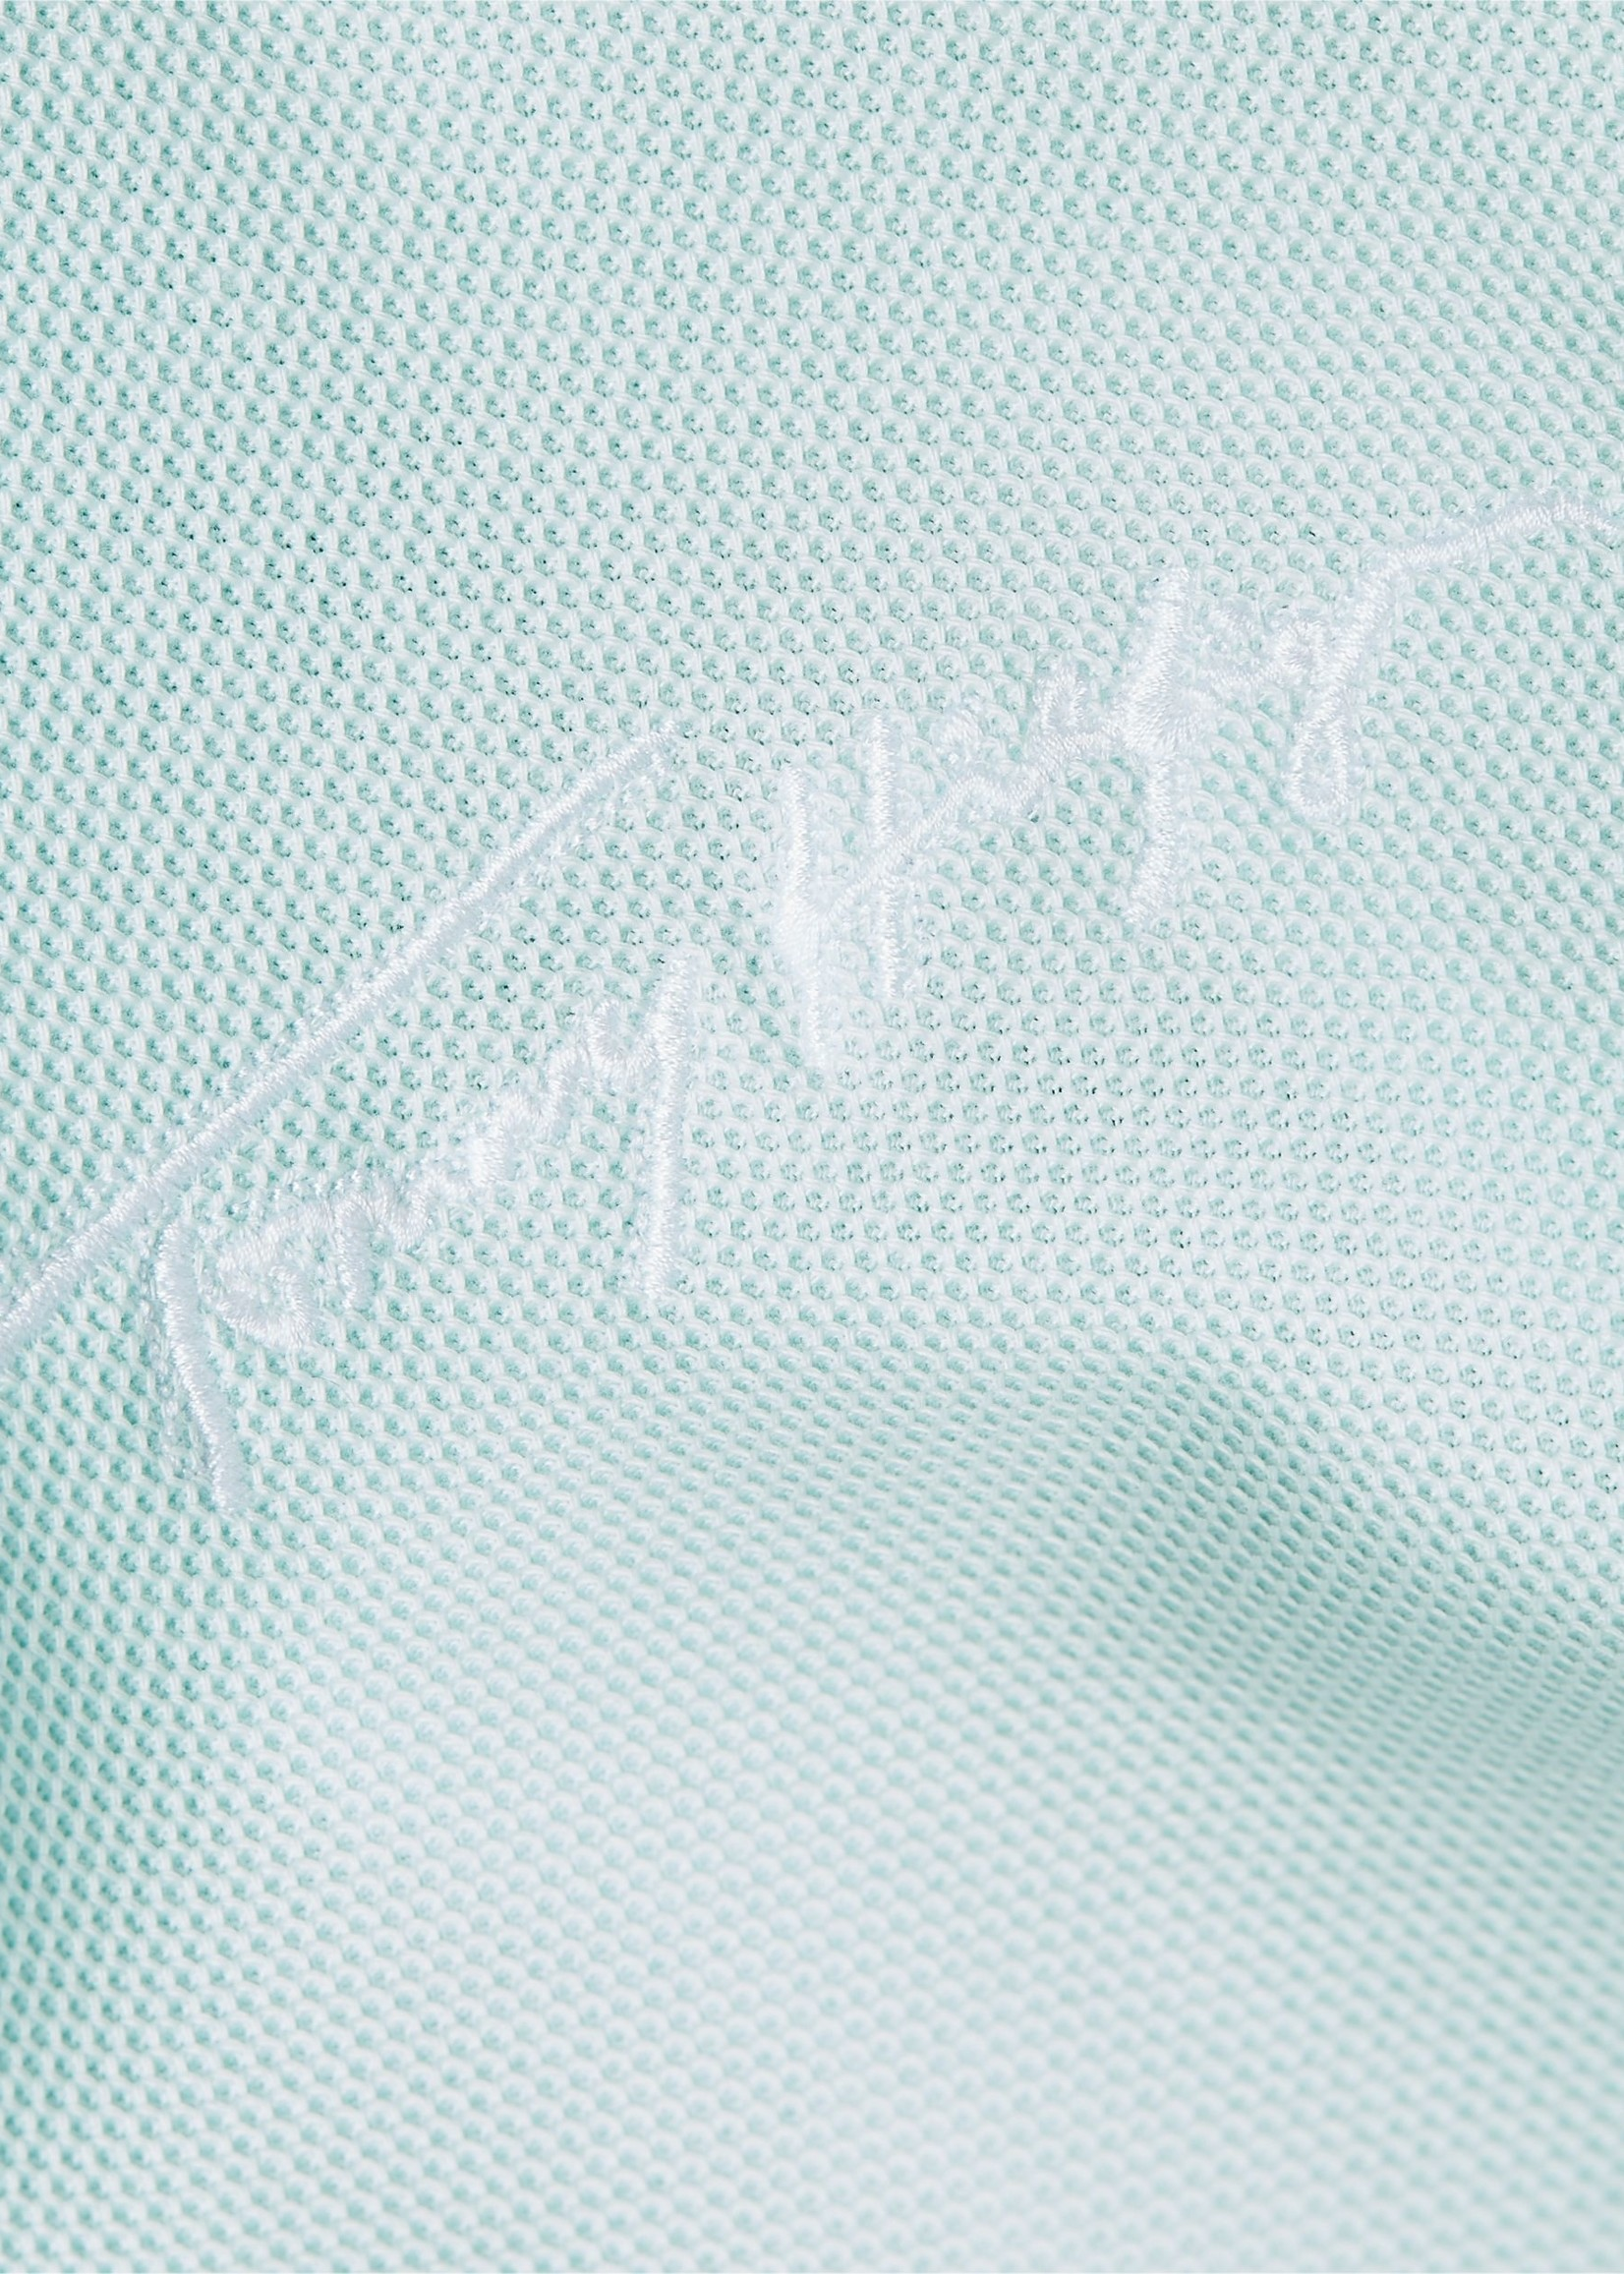 Tommy Hilfiger Polo van puur katoen met getipte kraag | Lichtgroen | Tommy Hilfiger